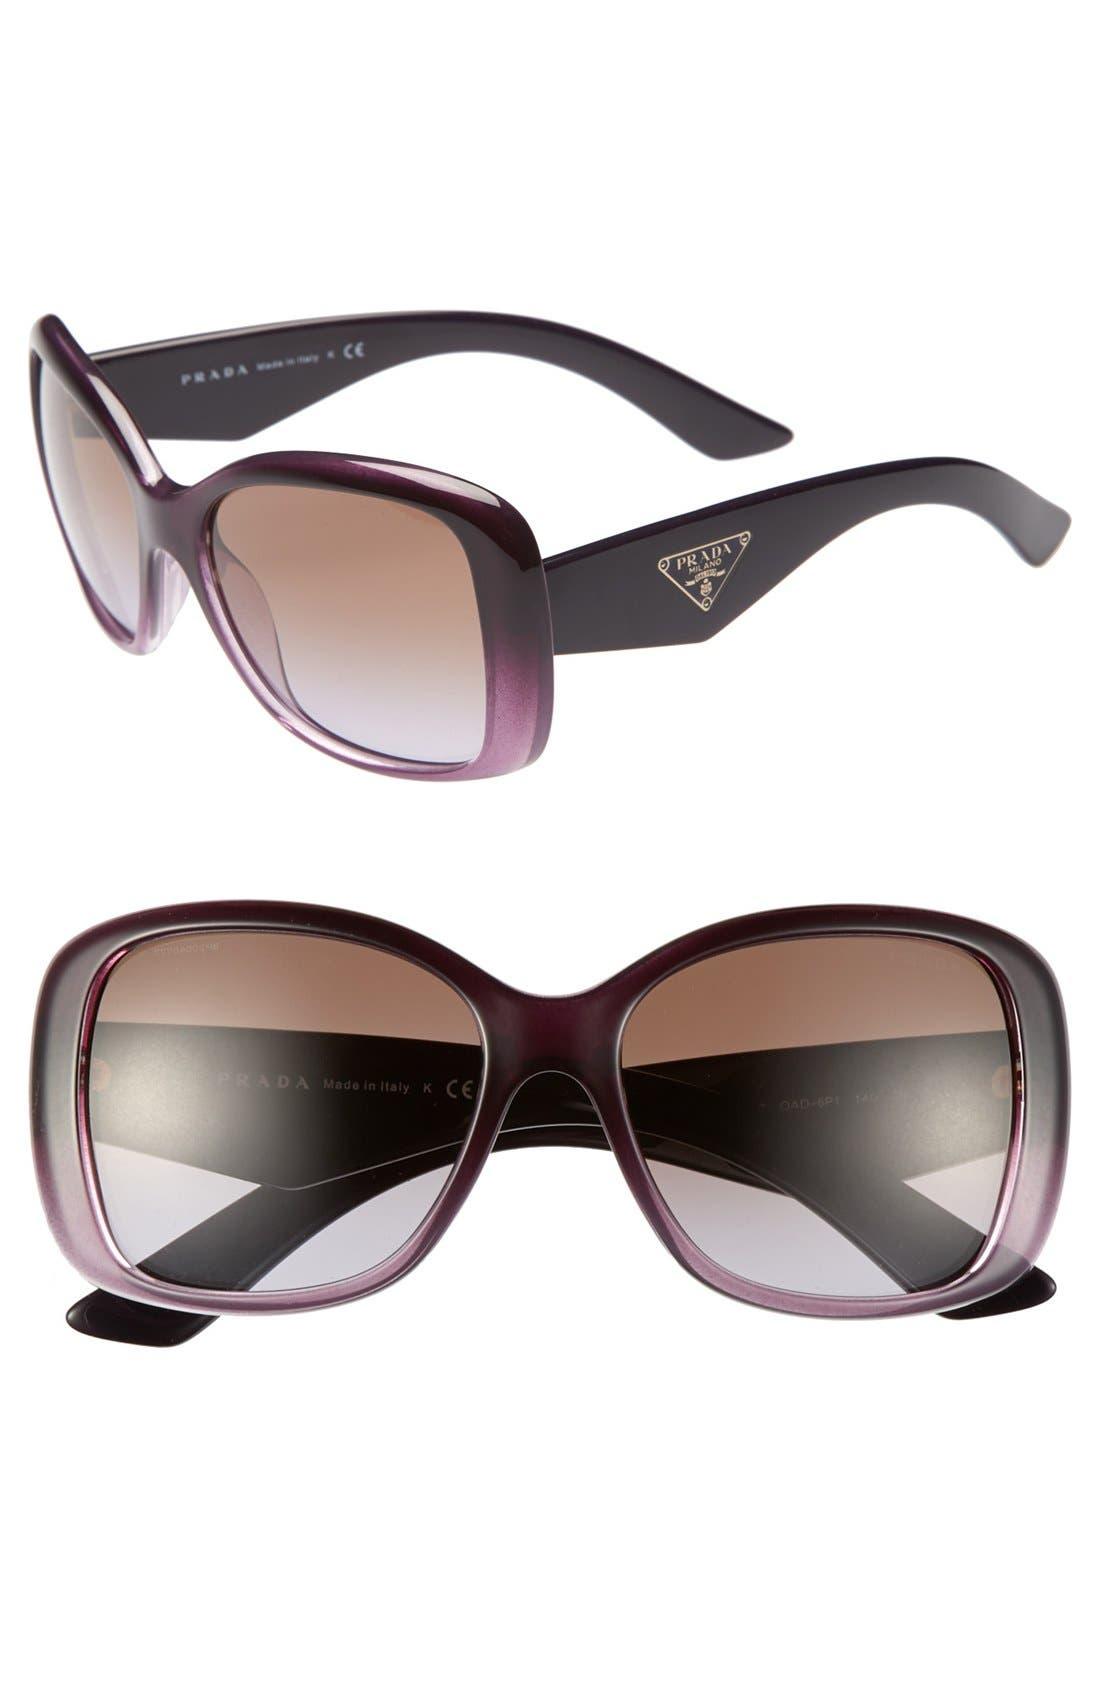 Alternate Image 1 Selected - Prada 57mm Oversized Sunglasses